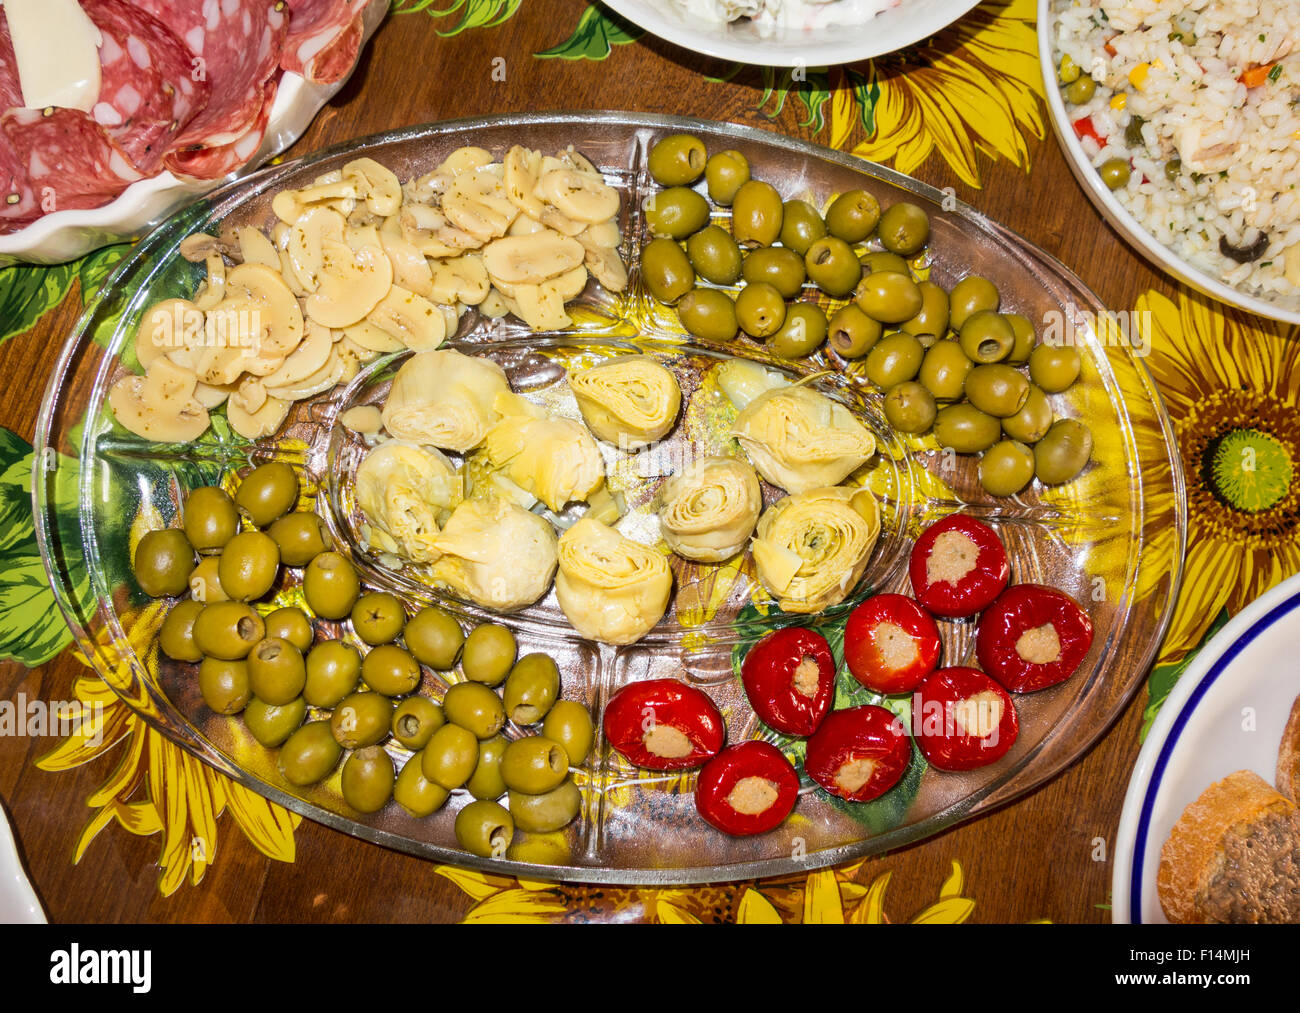 Antipasti selection - Stock Image